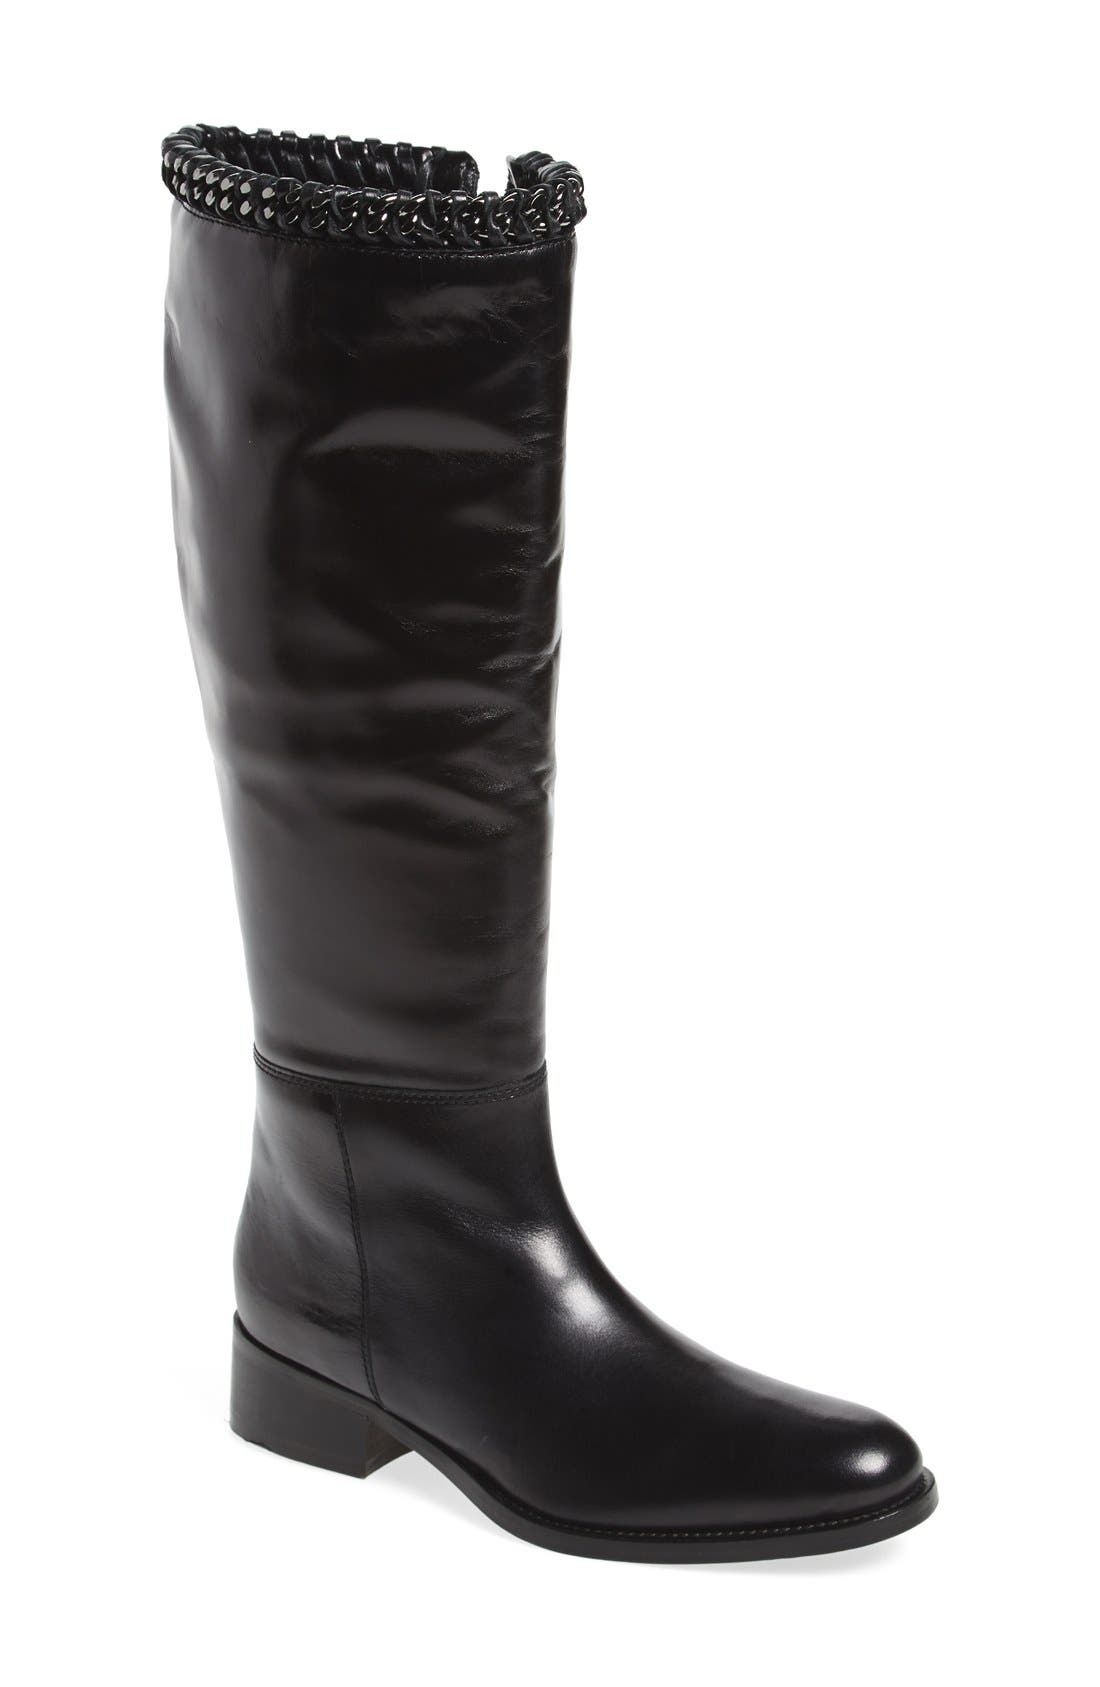 Alternate Image 1 Selected - Johnston & Murphy 'Sari' Knee High Boot (Women)